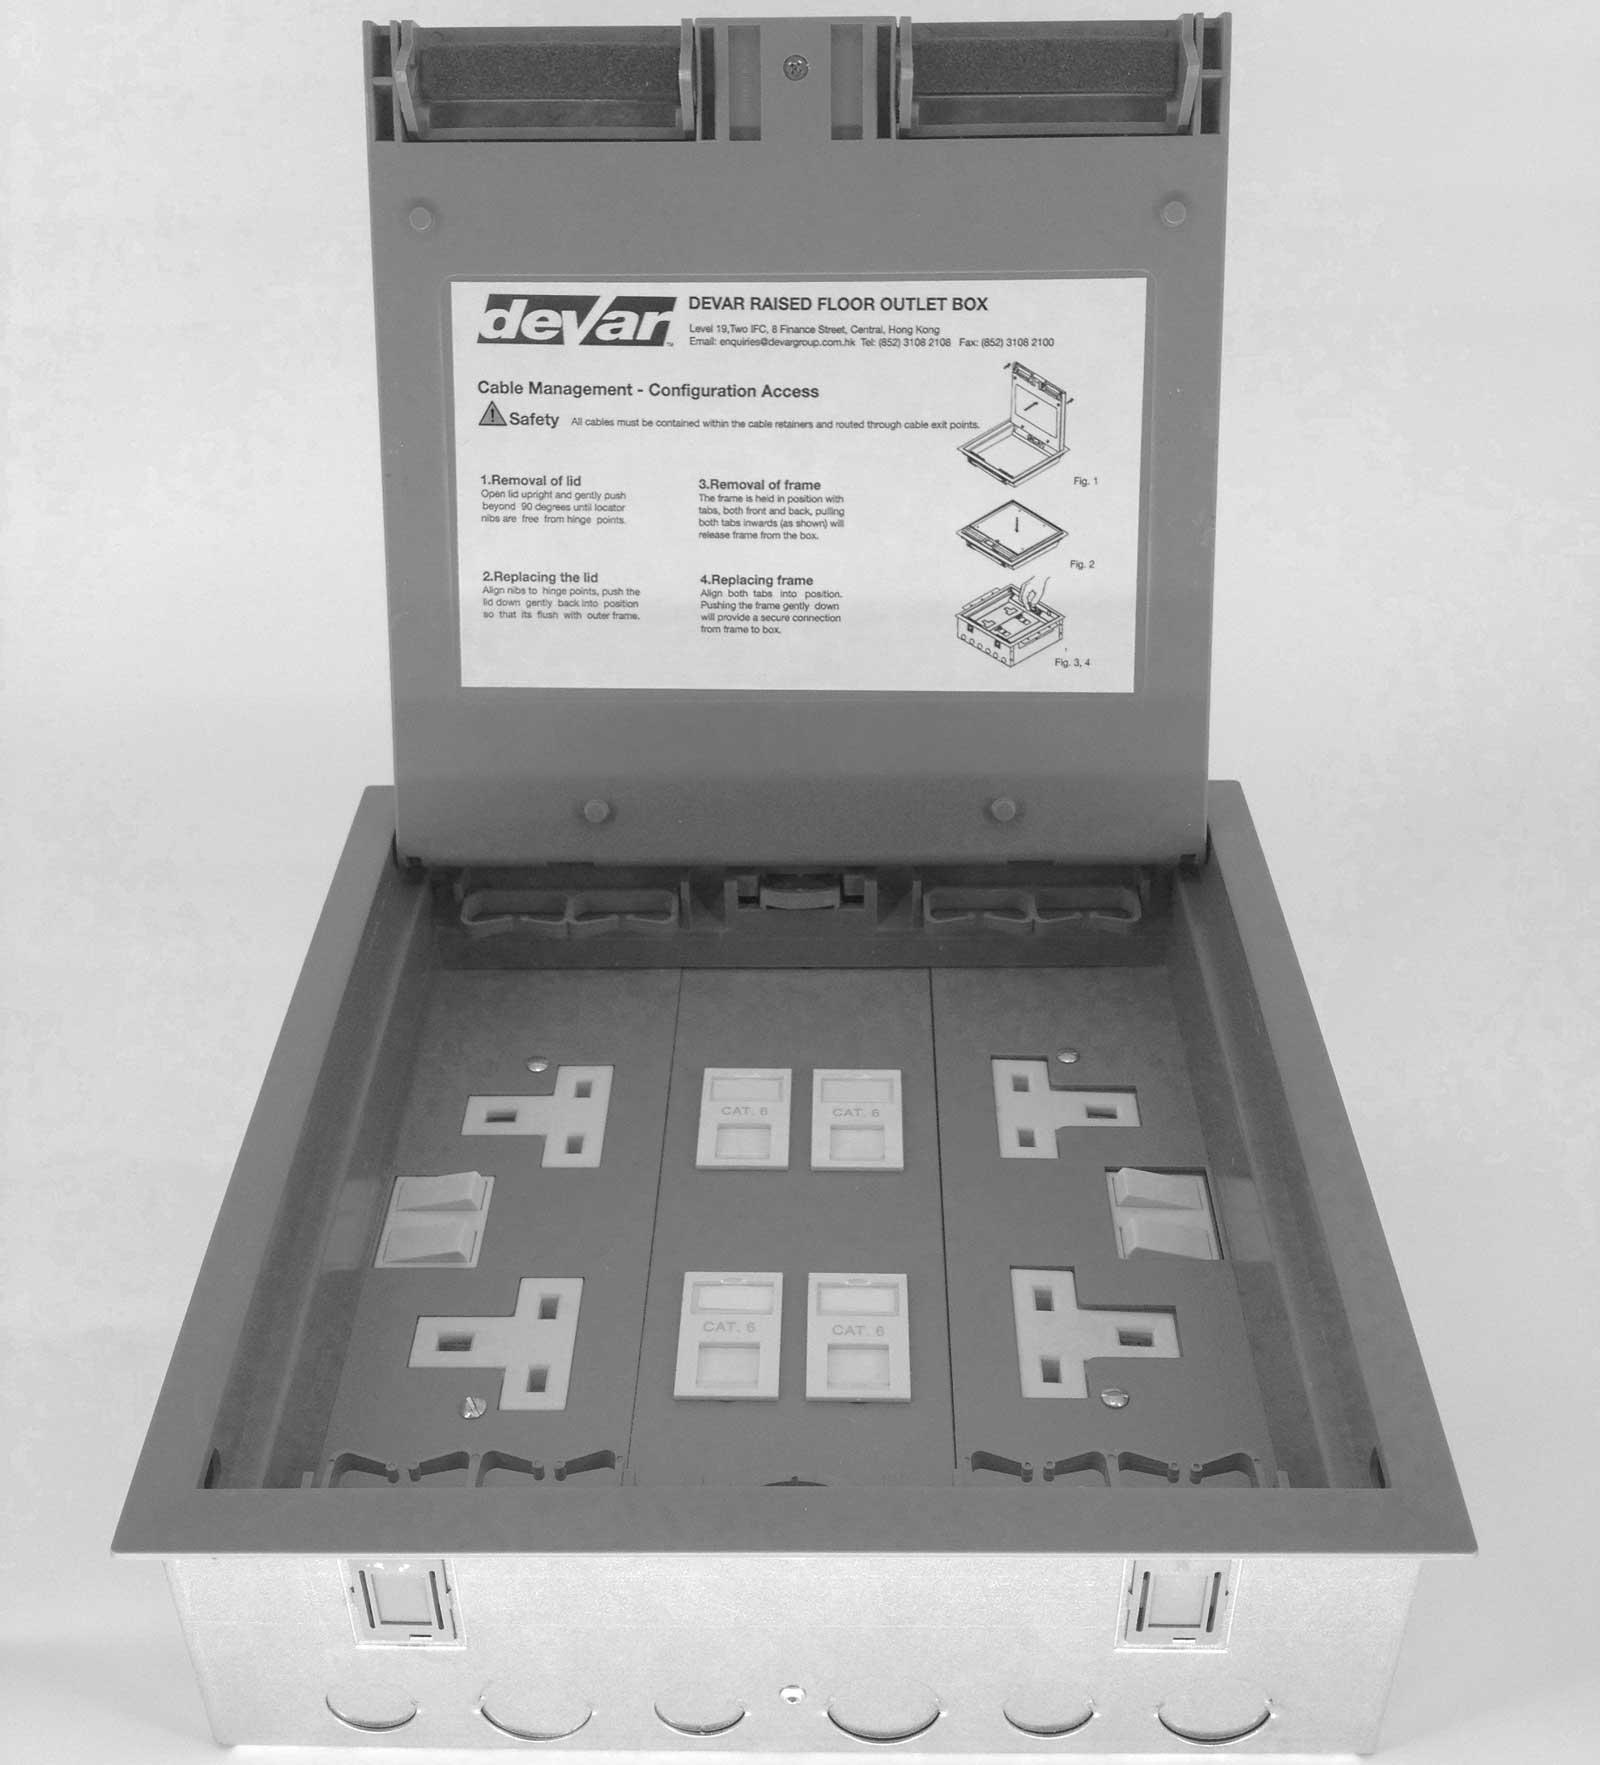 Raised Floor Outlet Box Devar 1